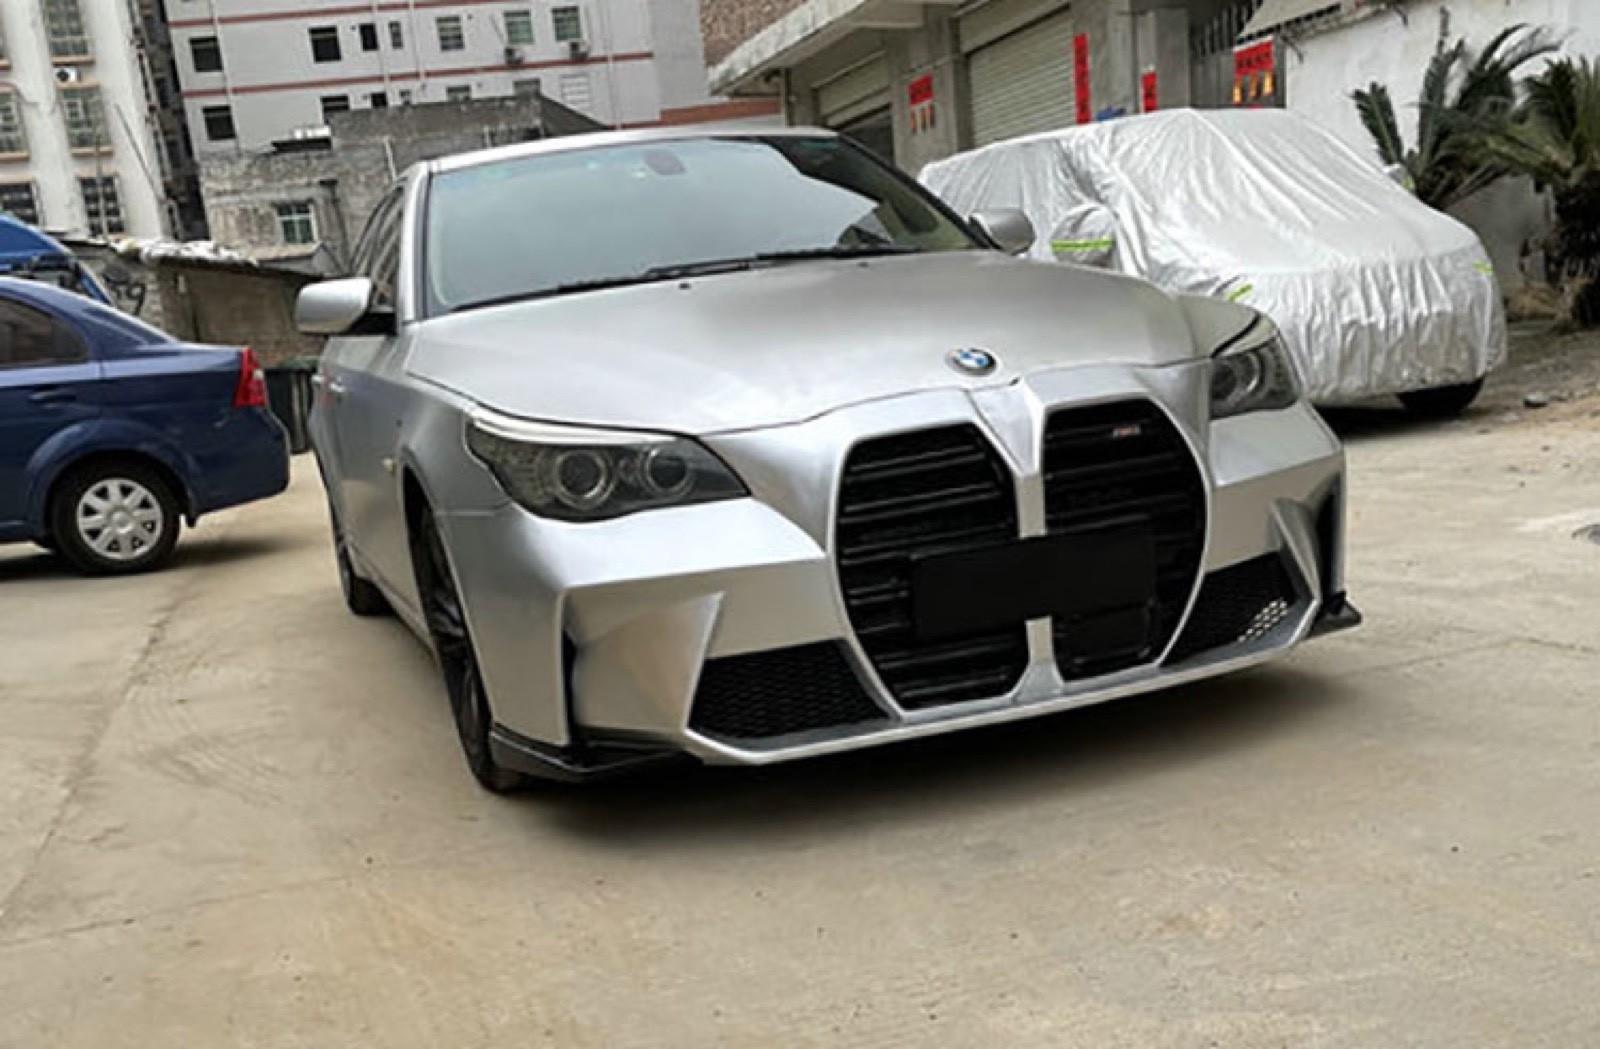 BMW_E60_grille-0002